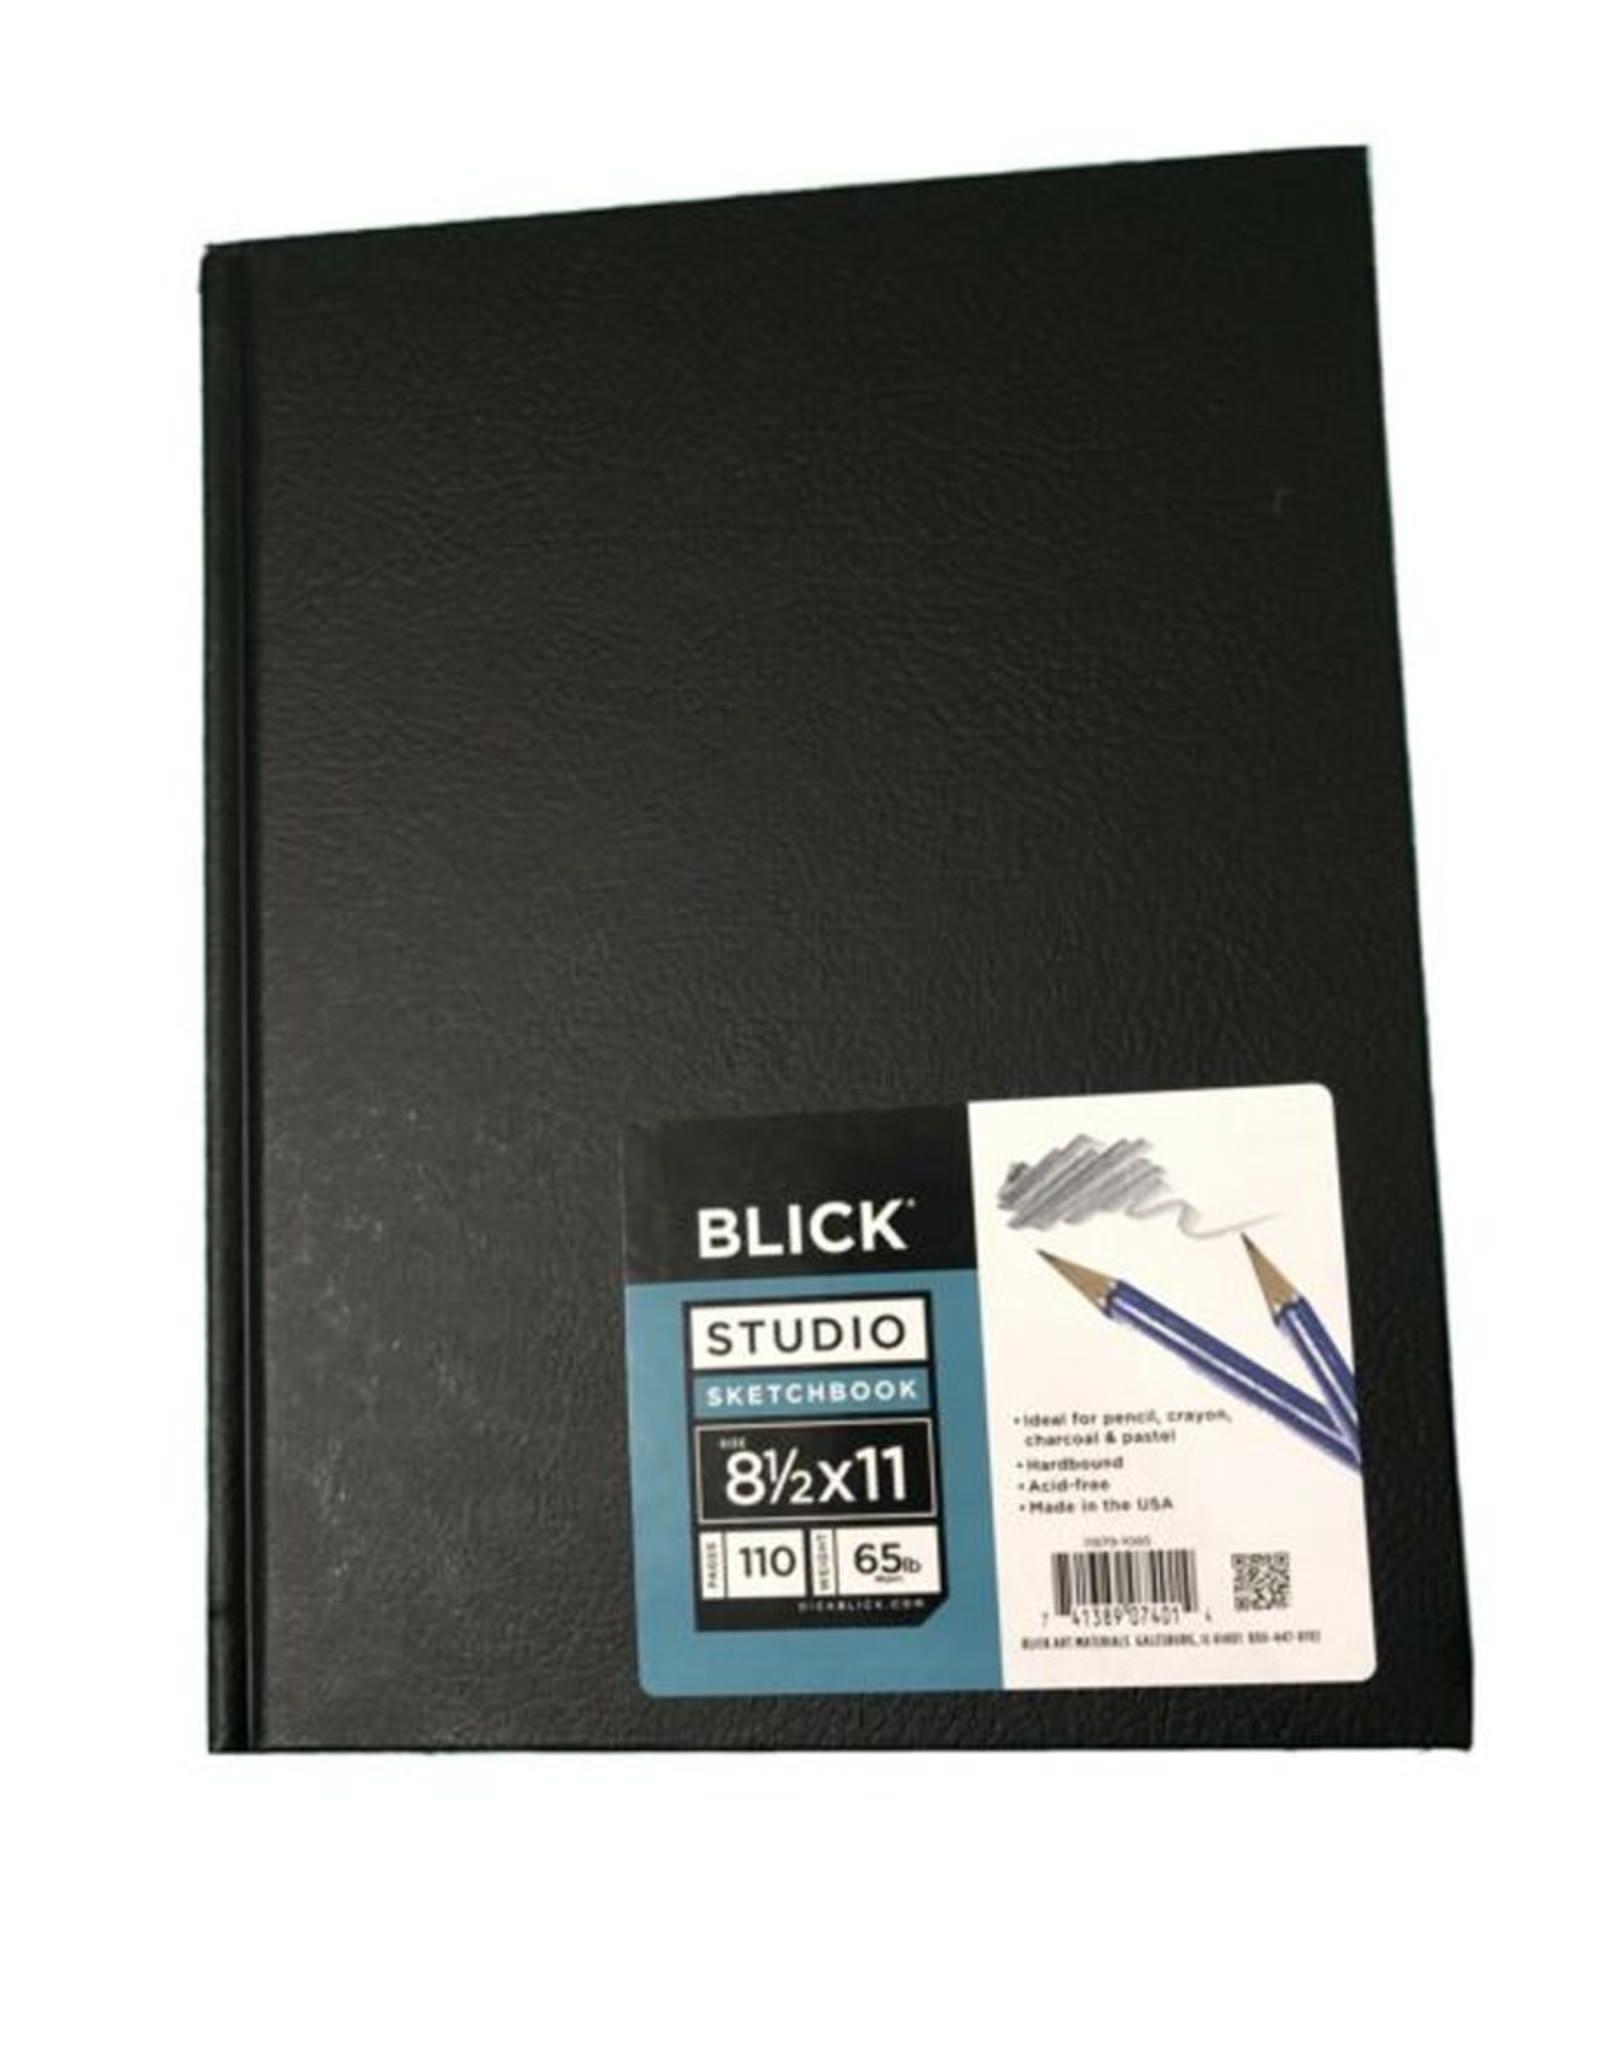 Sketchbook Hardbound 8 1/2 X11 Blick